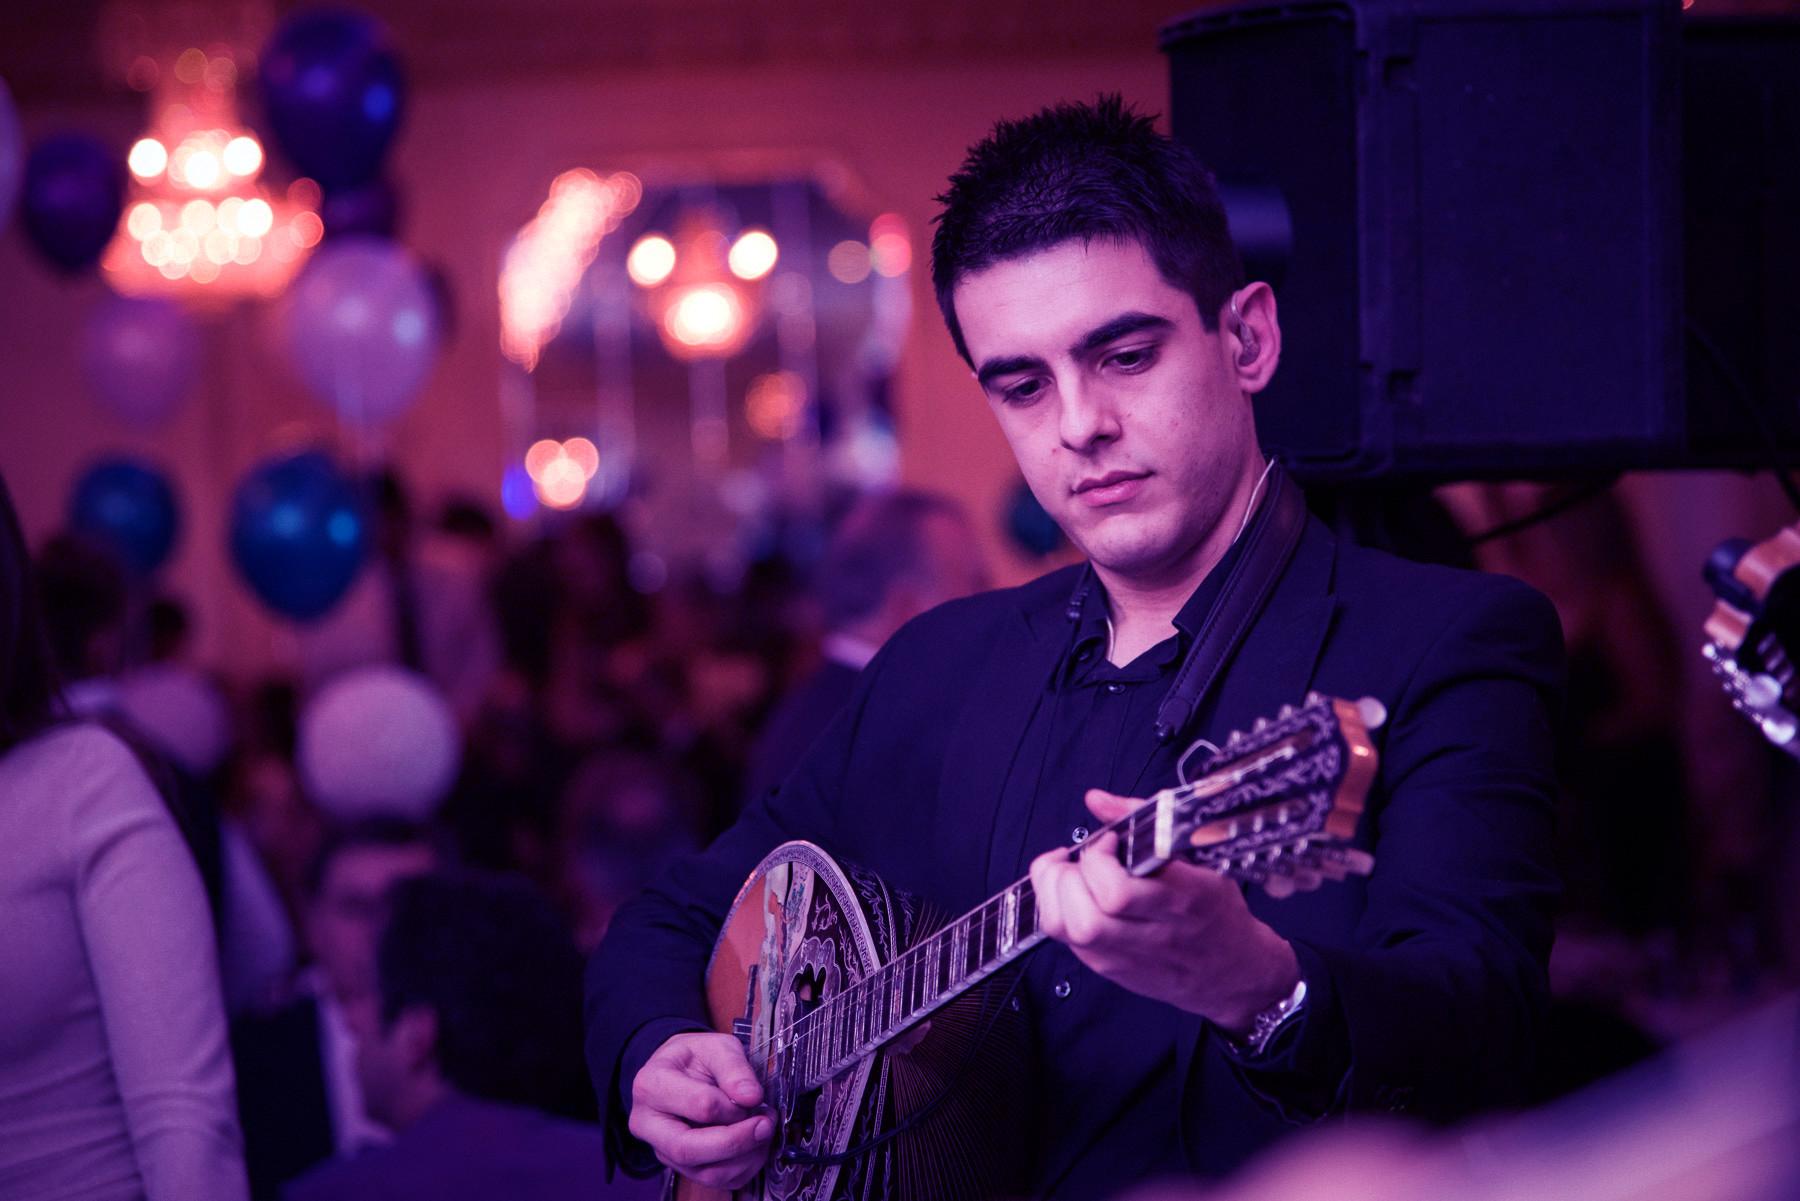 Odysseas Elia - Bouzouki/Violin/Keyboards   Οδυσσέας Ηλία – Μπουζούκι/βιολί/Πλήκτρα